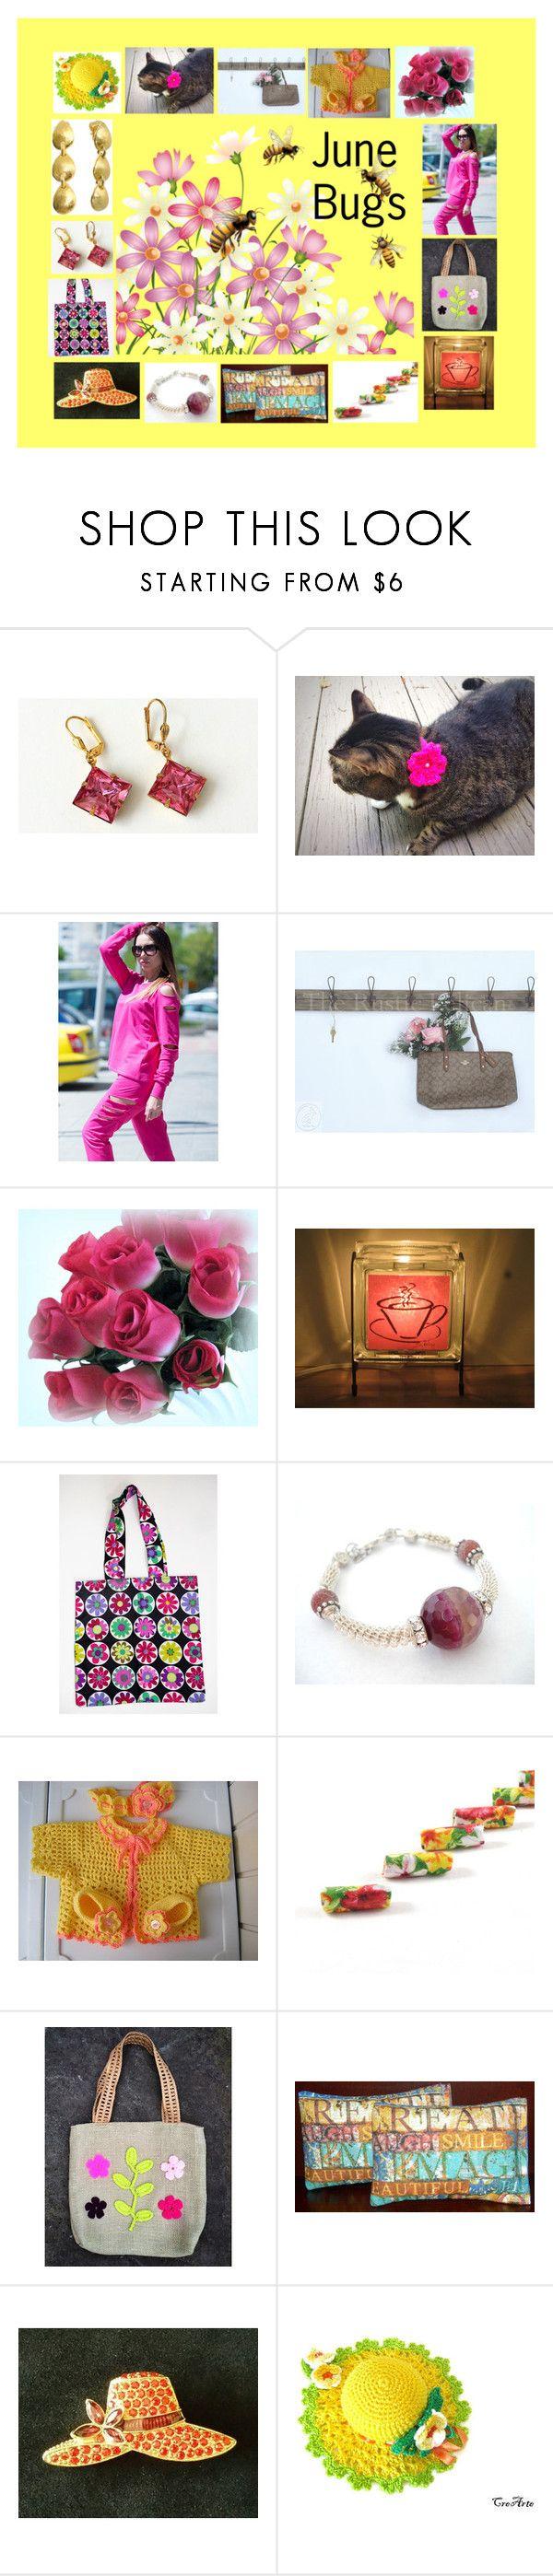 best 20+ coffee shop online ideas on pinterest | cafe shop design